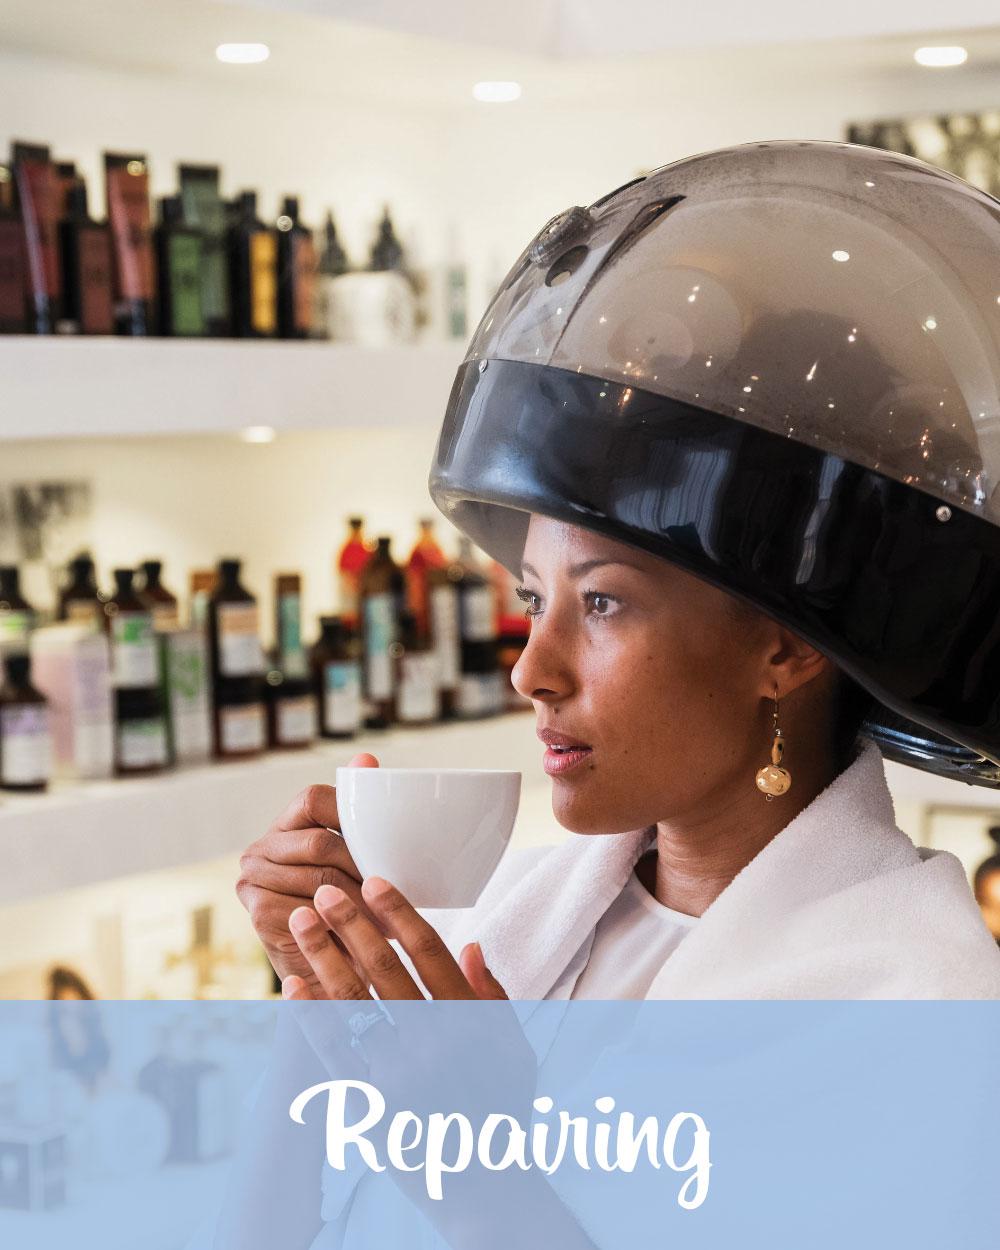 Treatments - Repairing